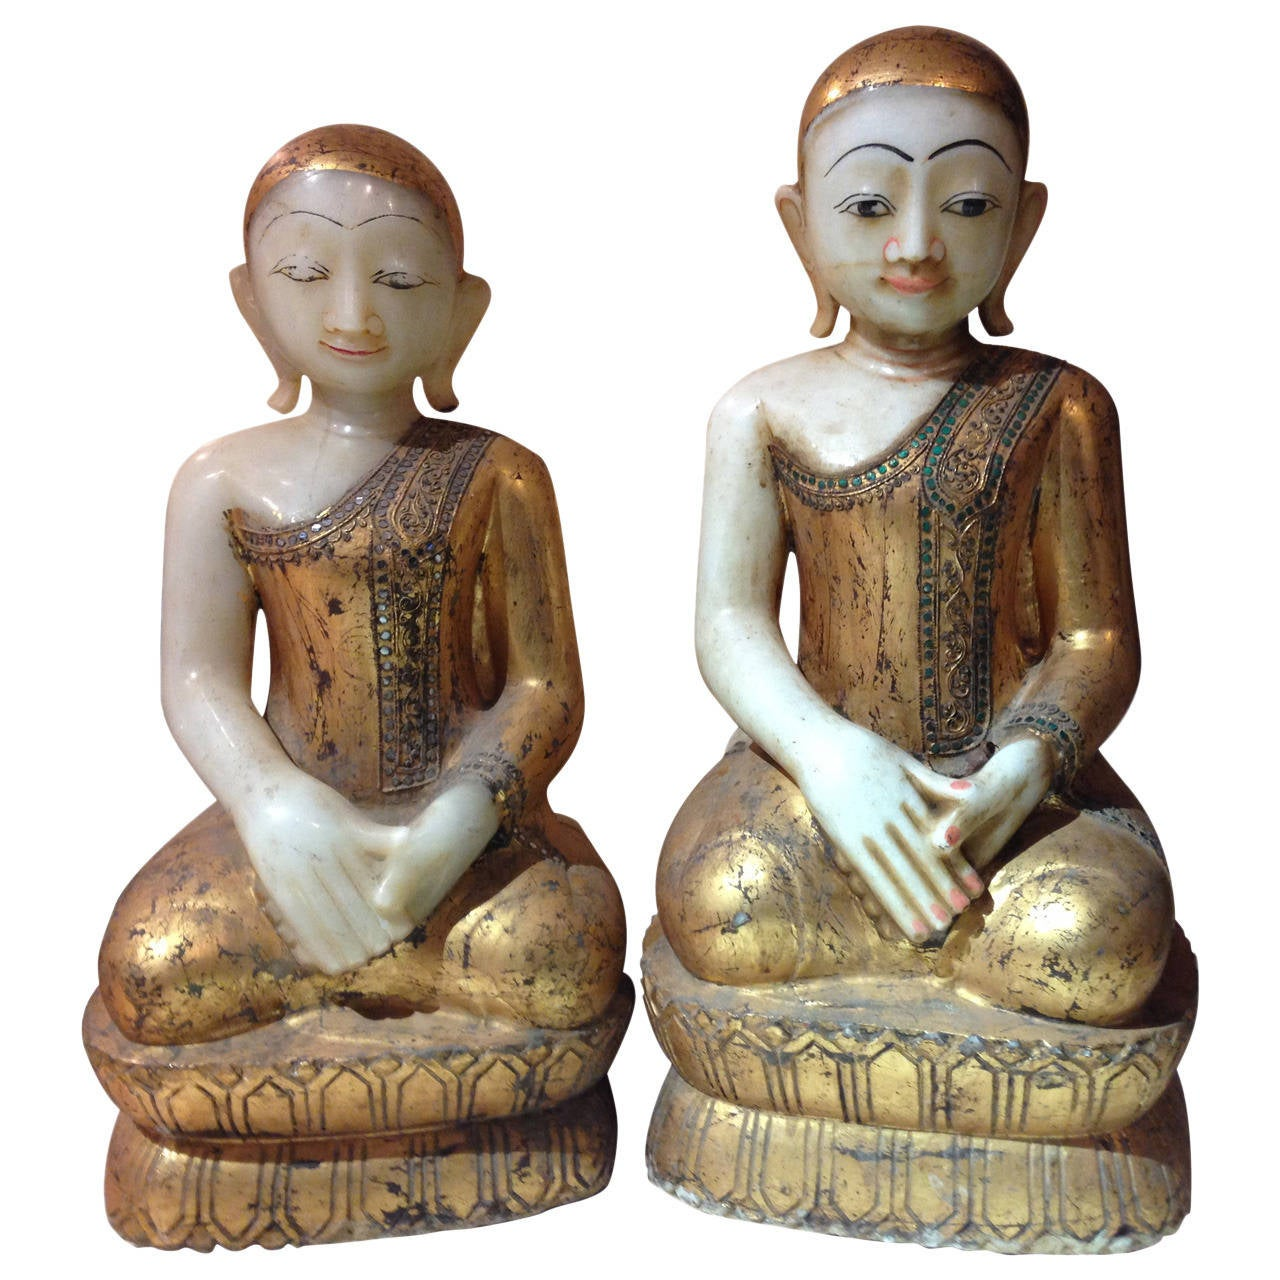 Antique Pair Hand Carved Hand Gilt Stone Garden Attendants Joyful Faces For  Sale